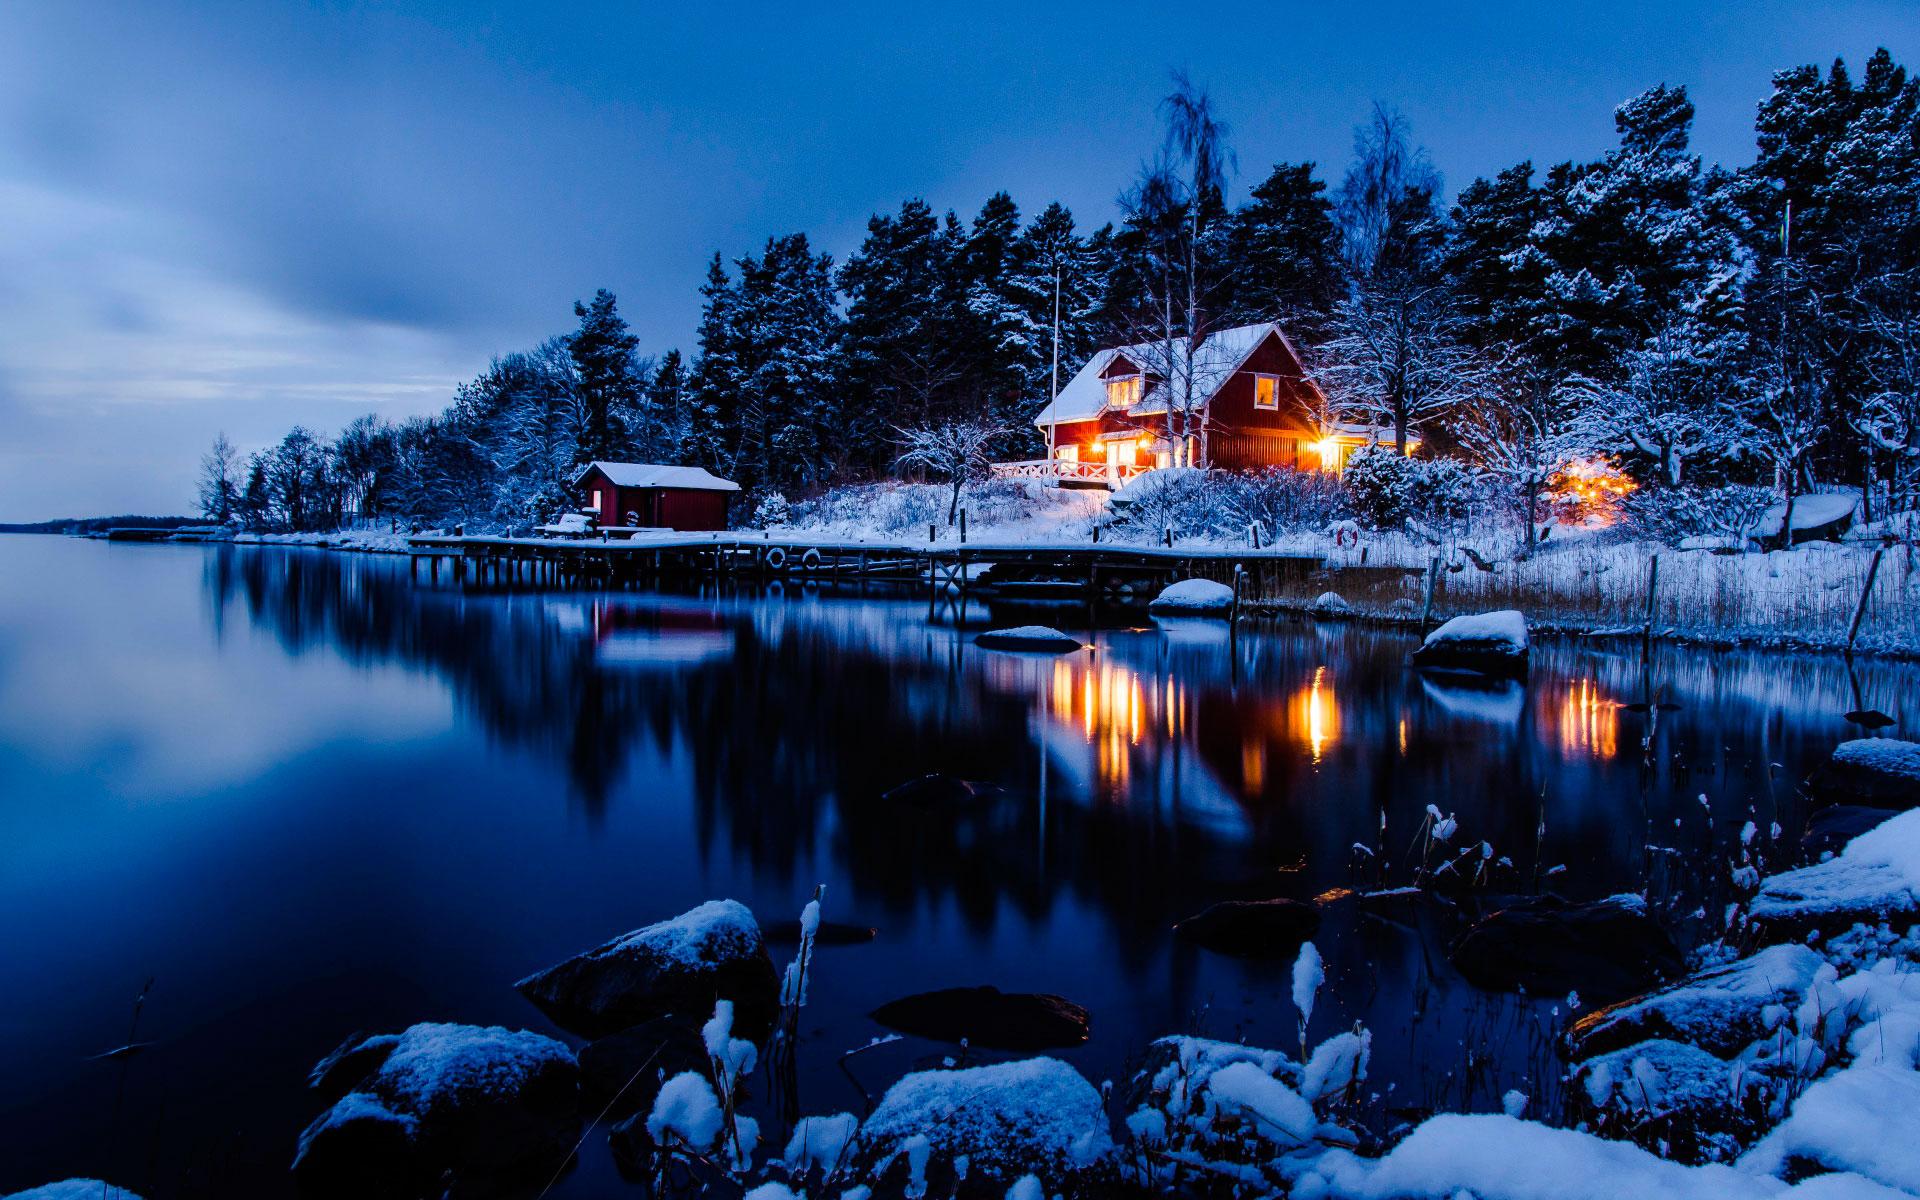 <p>Озеро зимой</p>